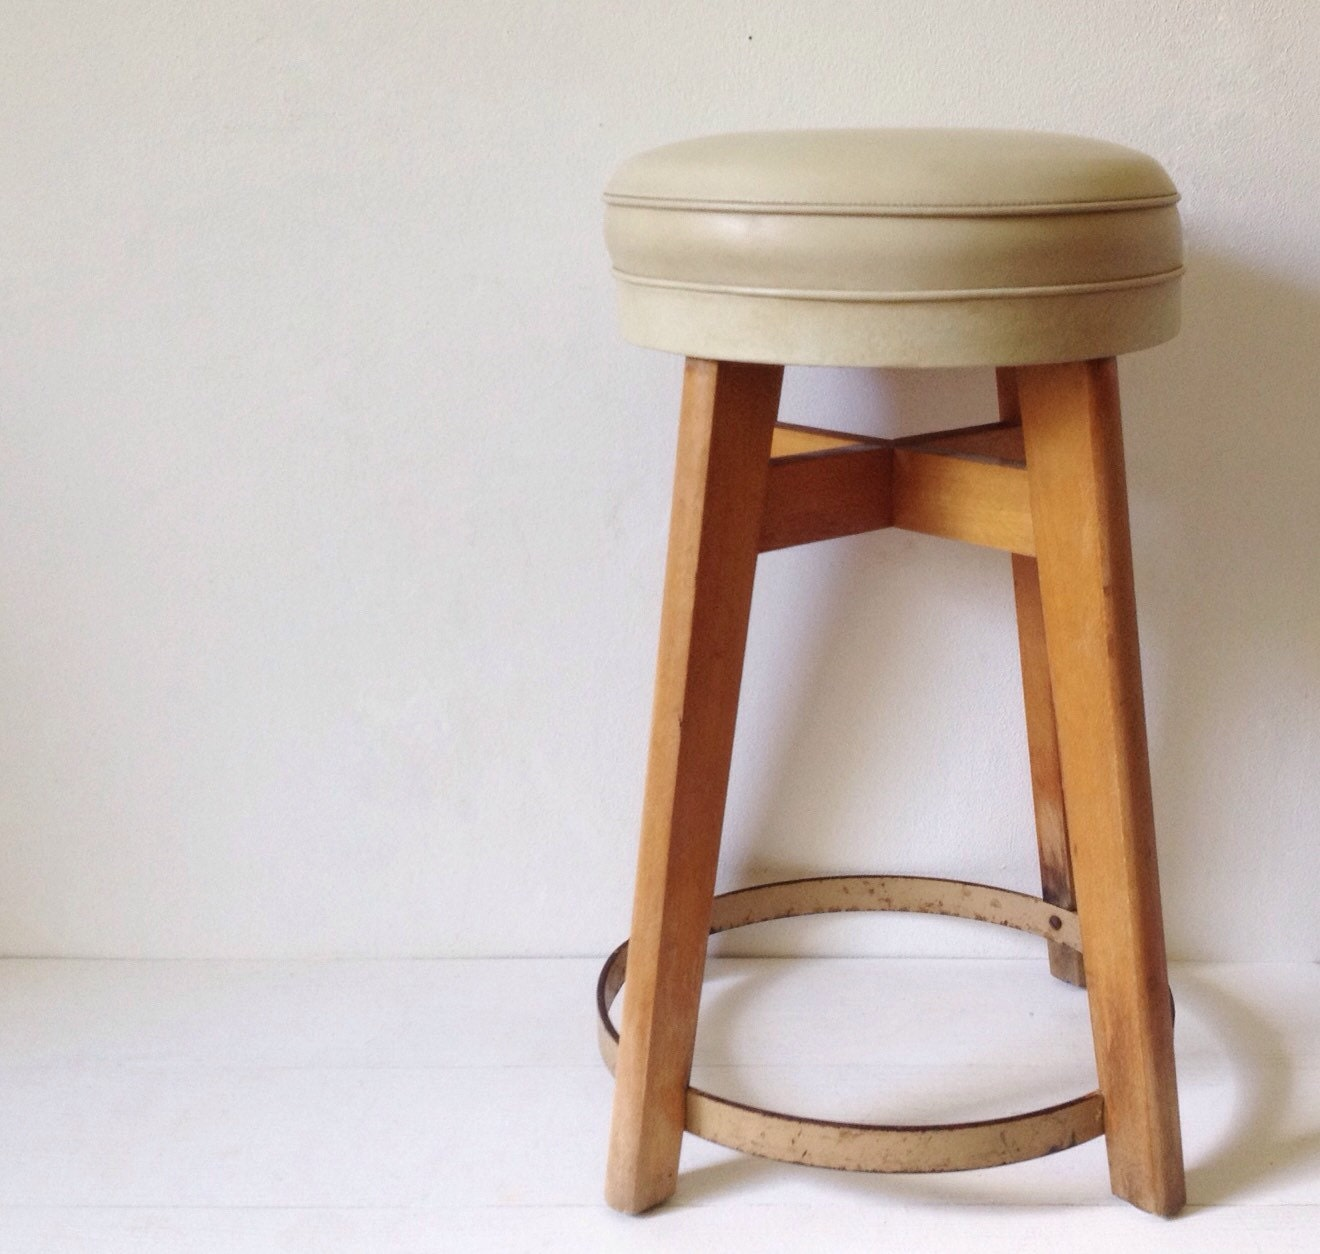 Mid century stool Benchairs retro bar stool with cream vinyl : ilfullxfull102158989965eo from www.etsy.com size 1320 x 1254 jpeg 203kB